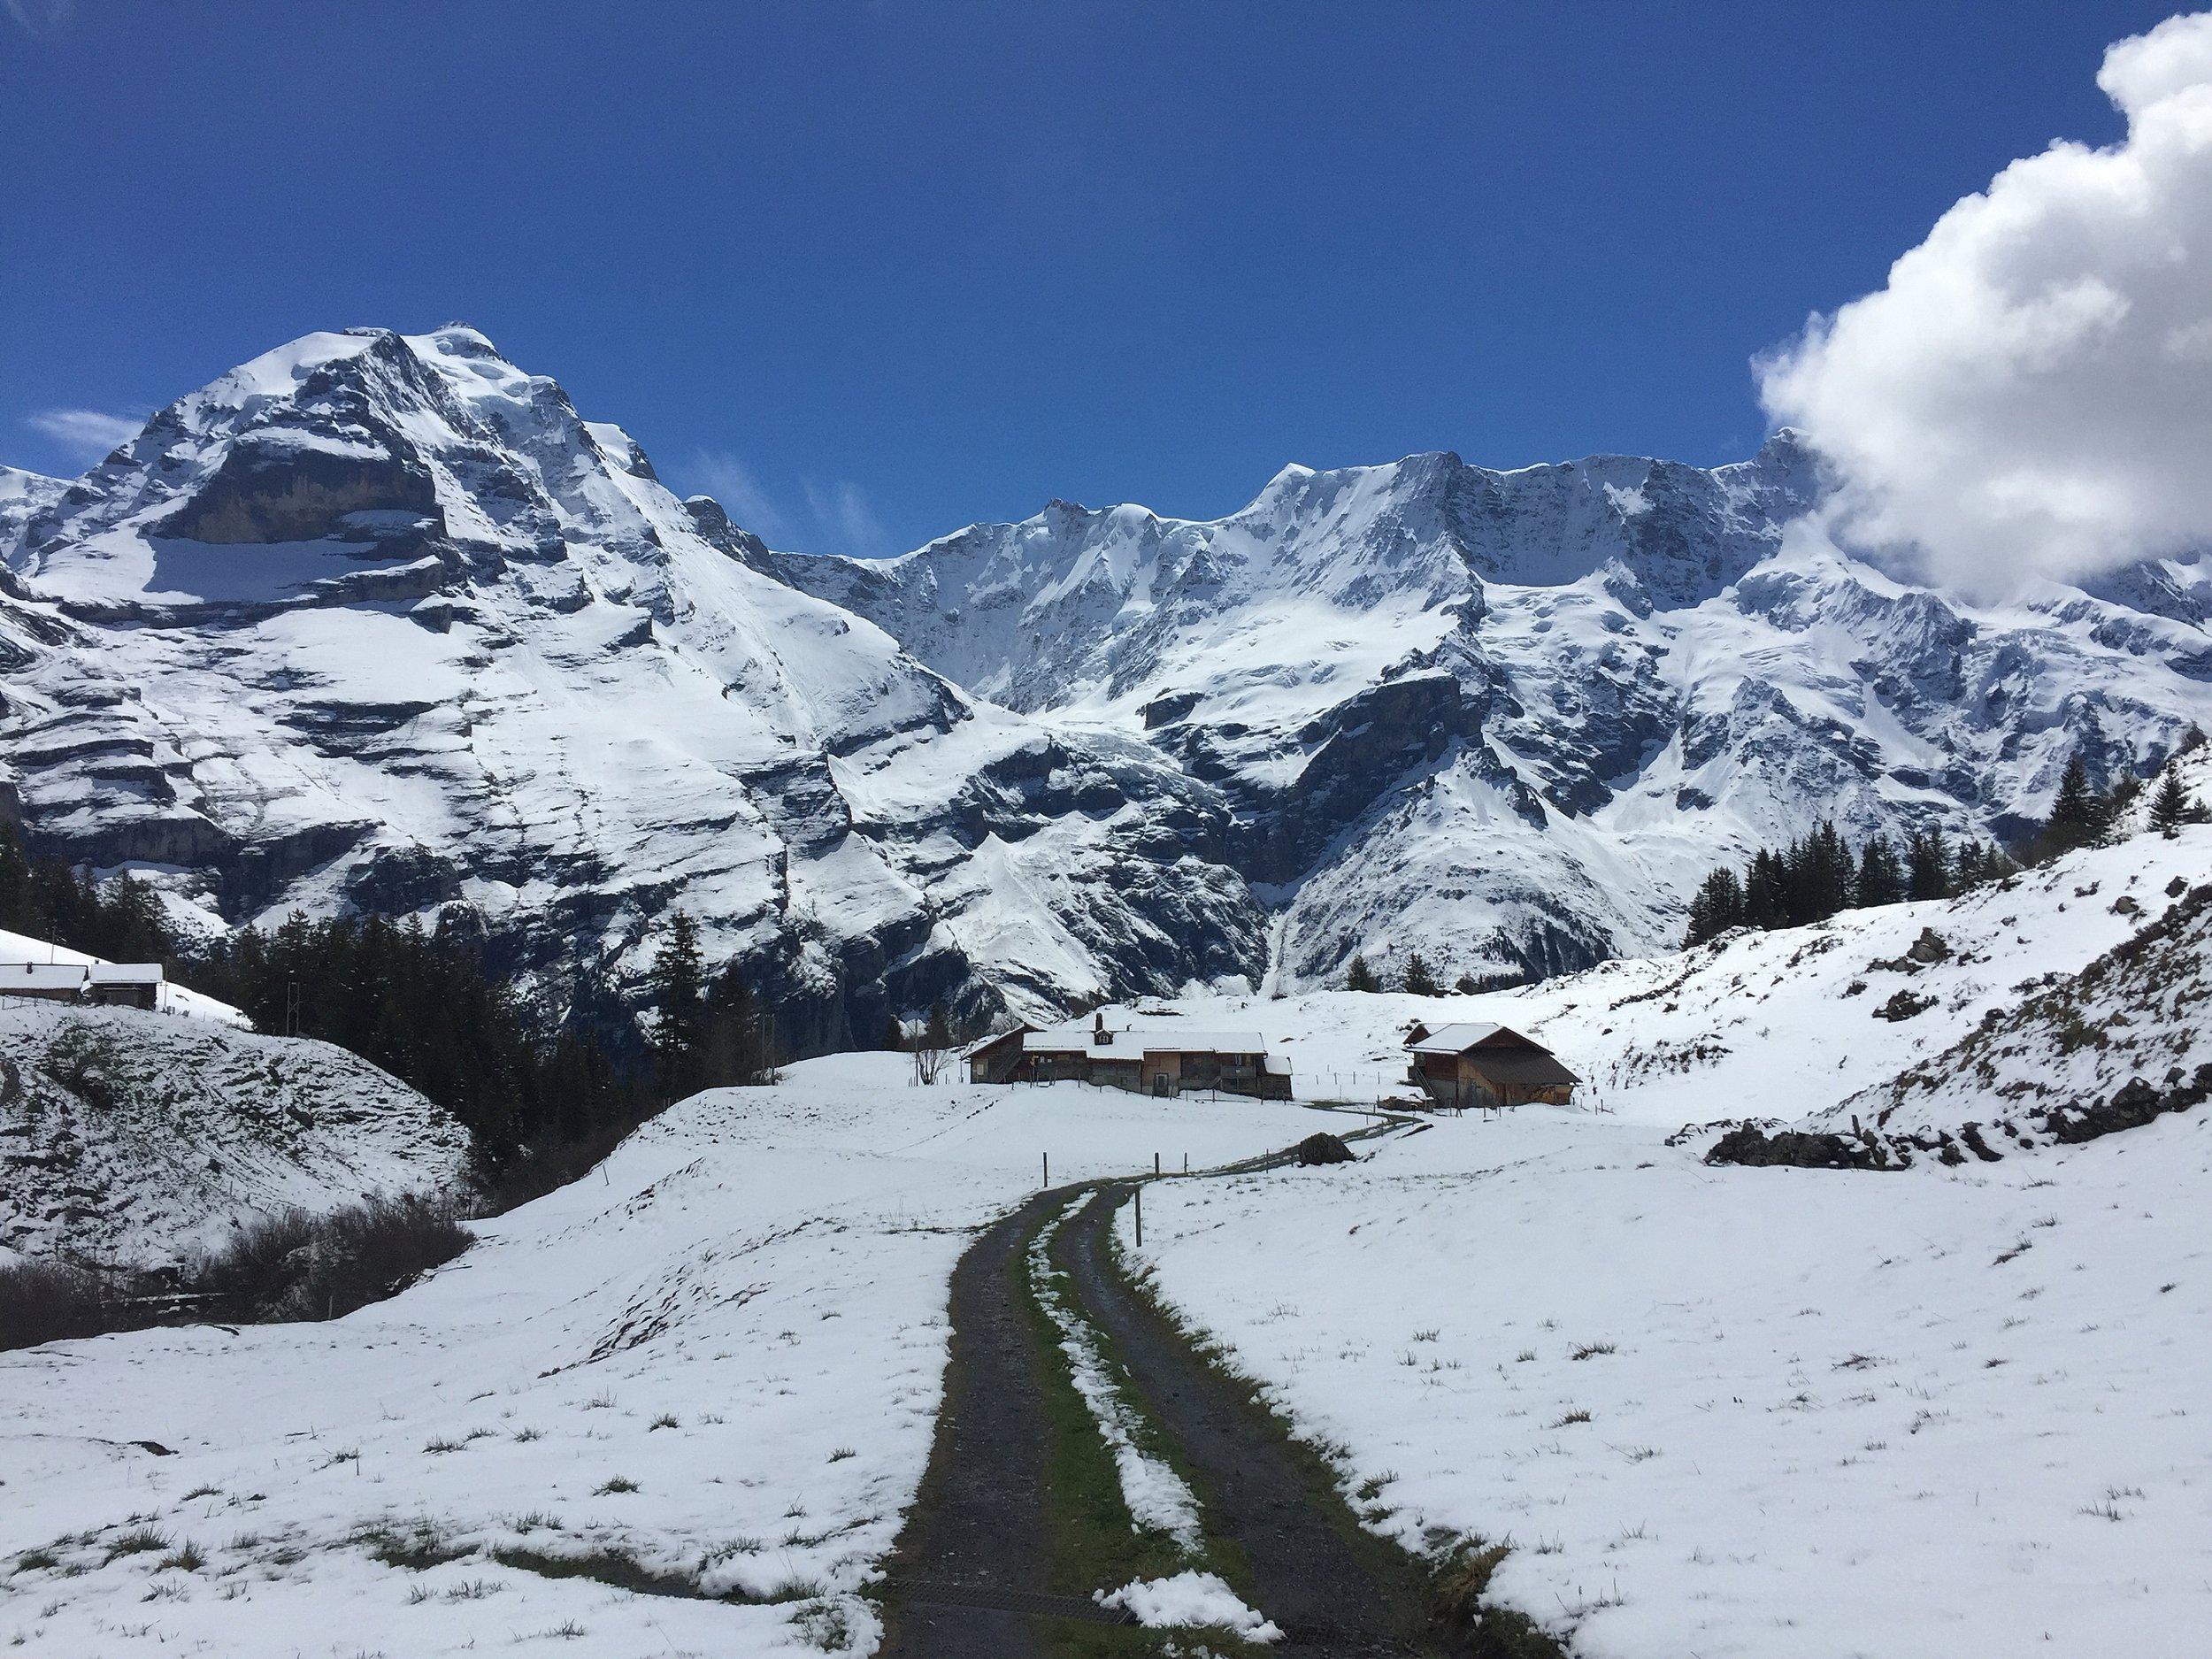 North Face Trail_0009.jpg